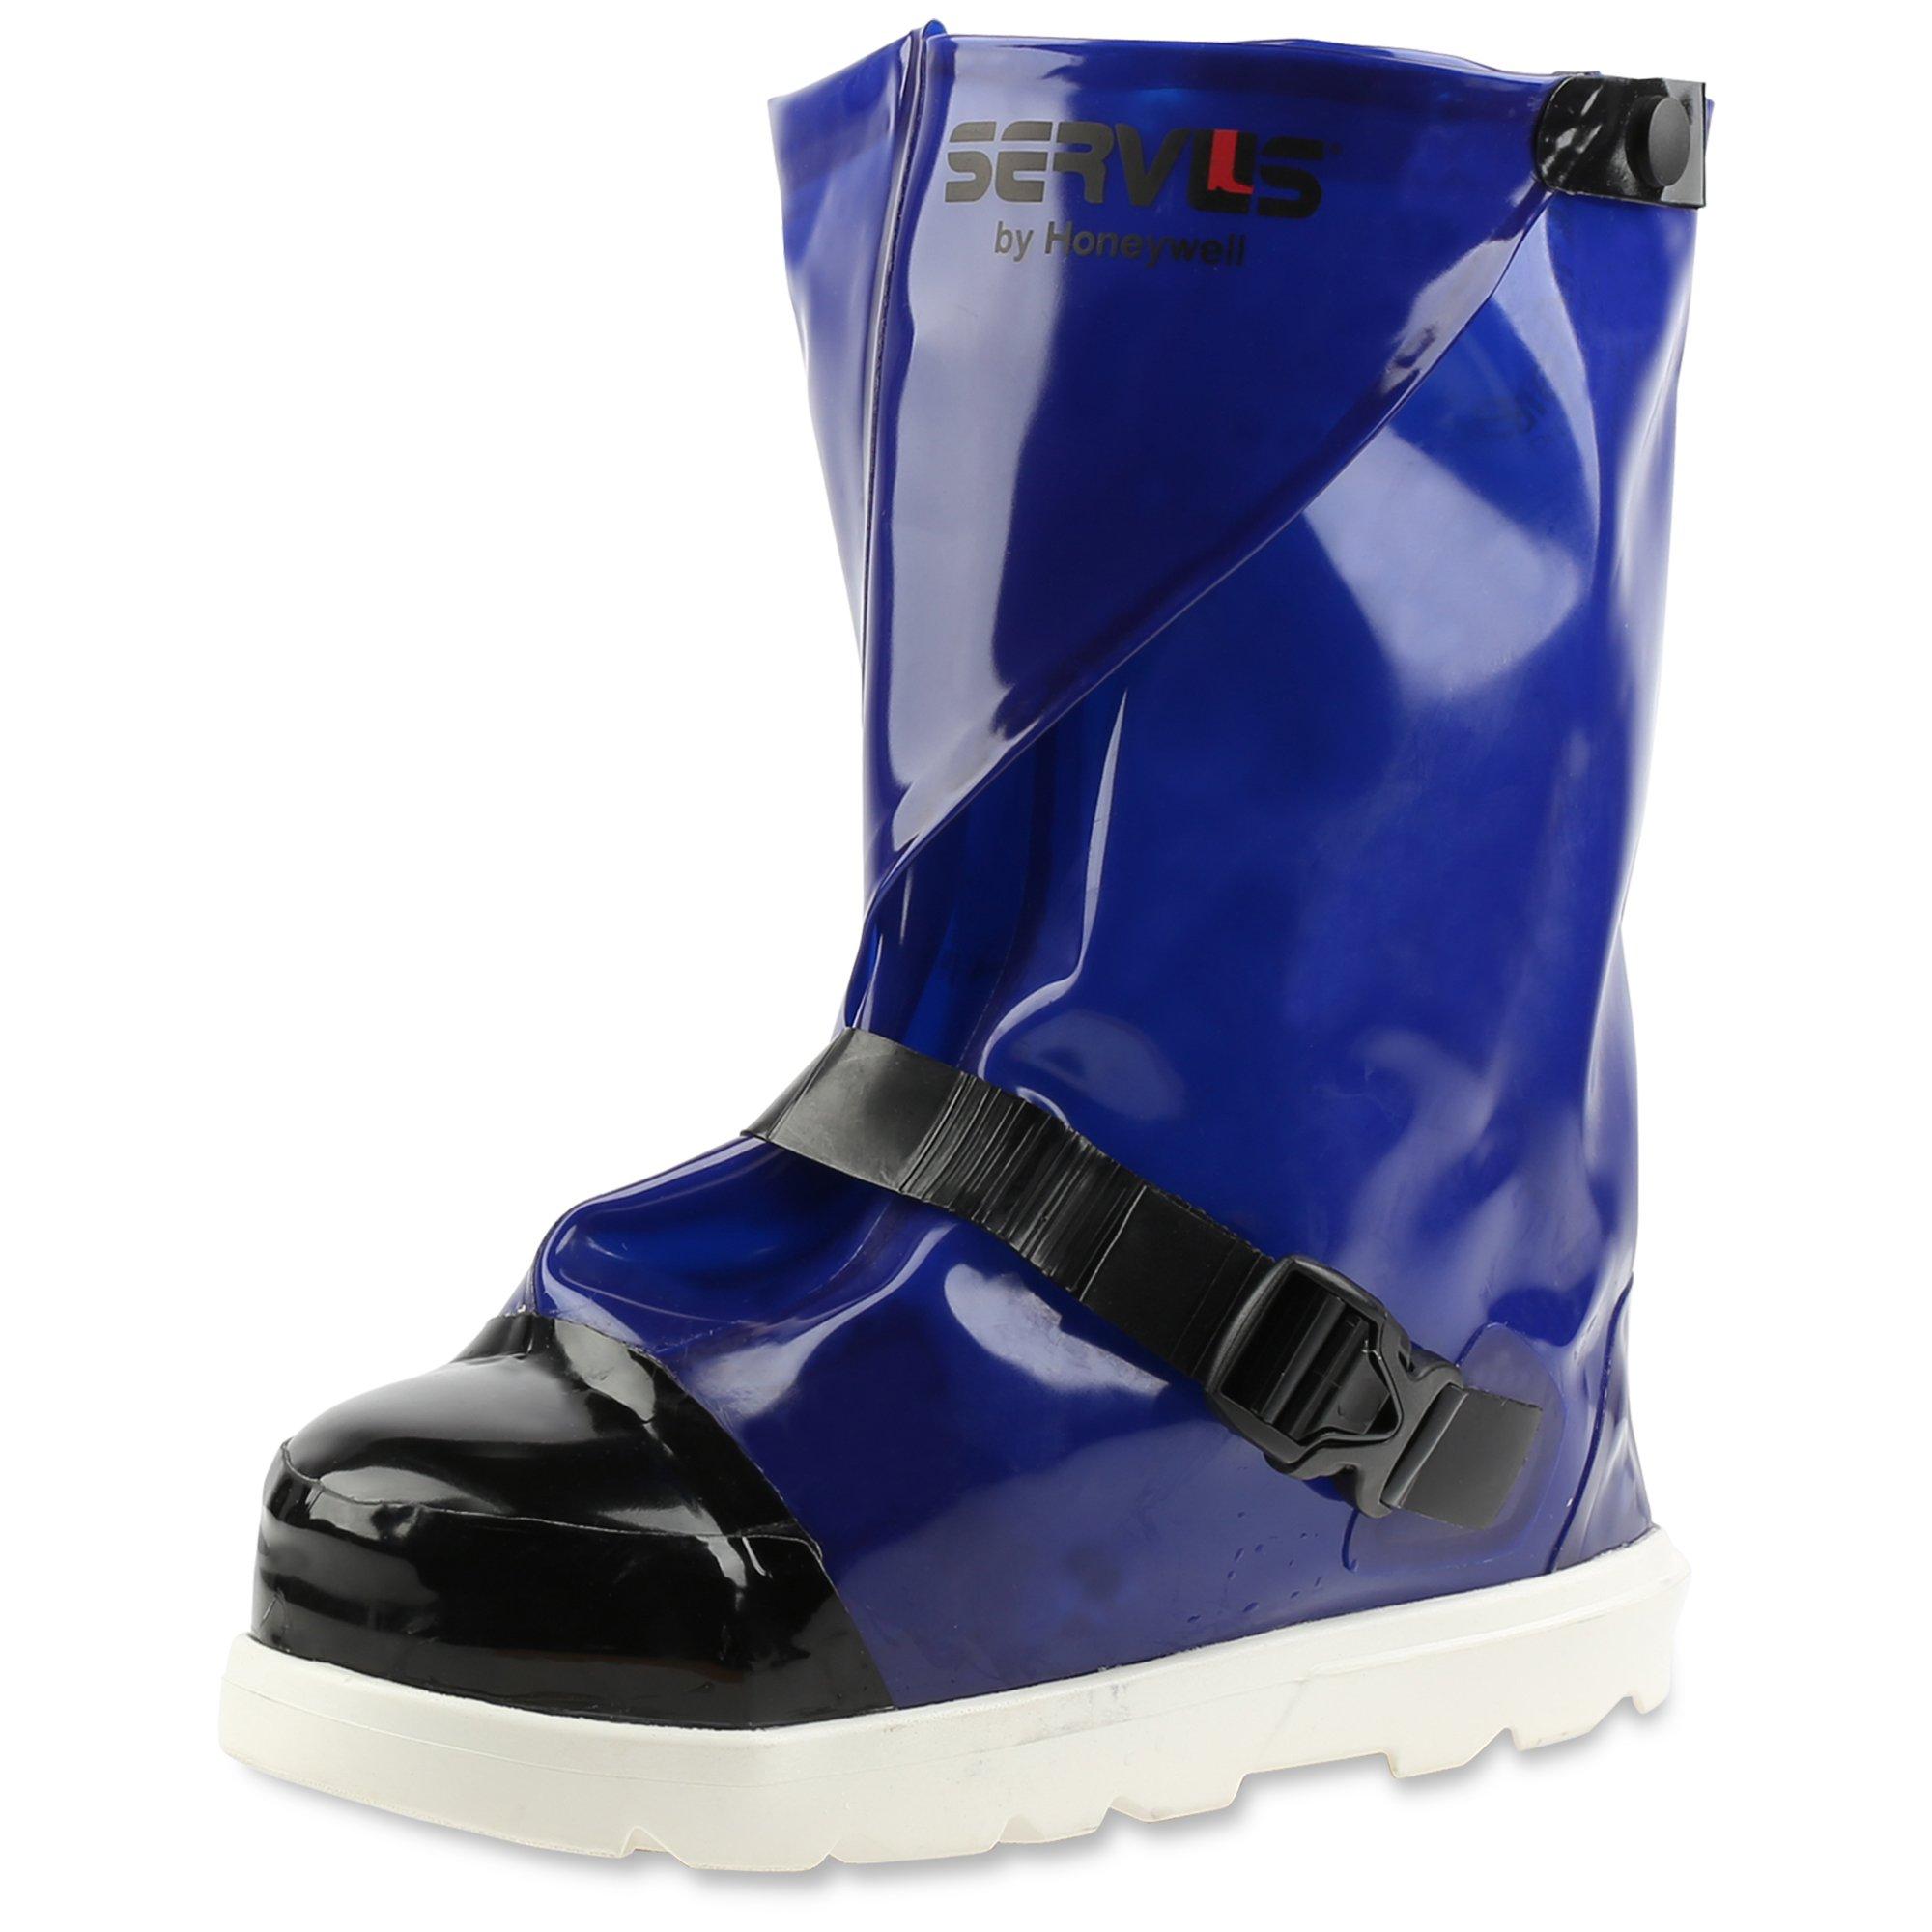 Servus 12'' Polyurethane Steel Toe Processing Overboots, Blue & White (IT12ST17)